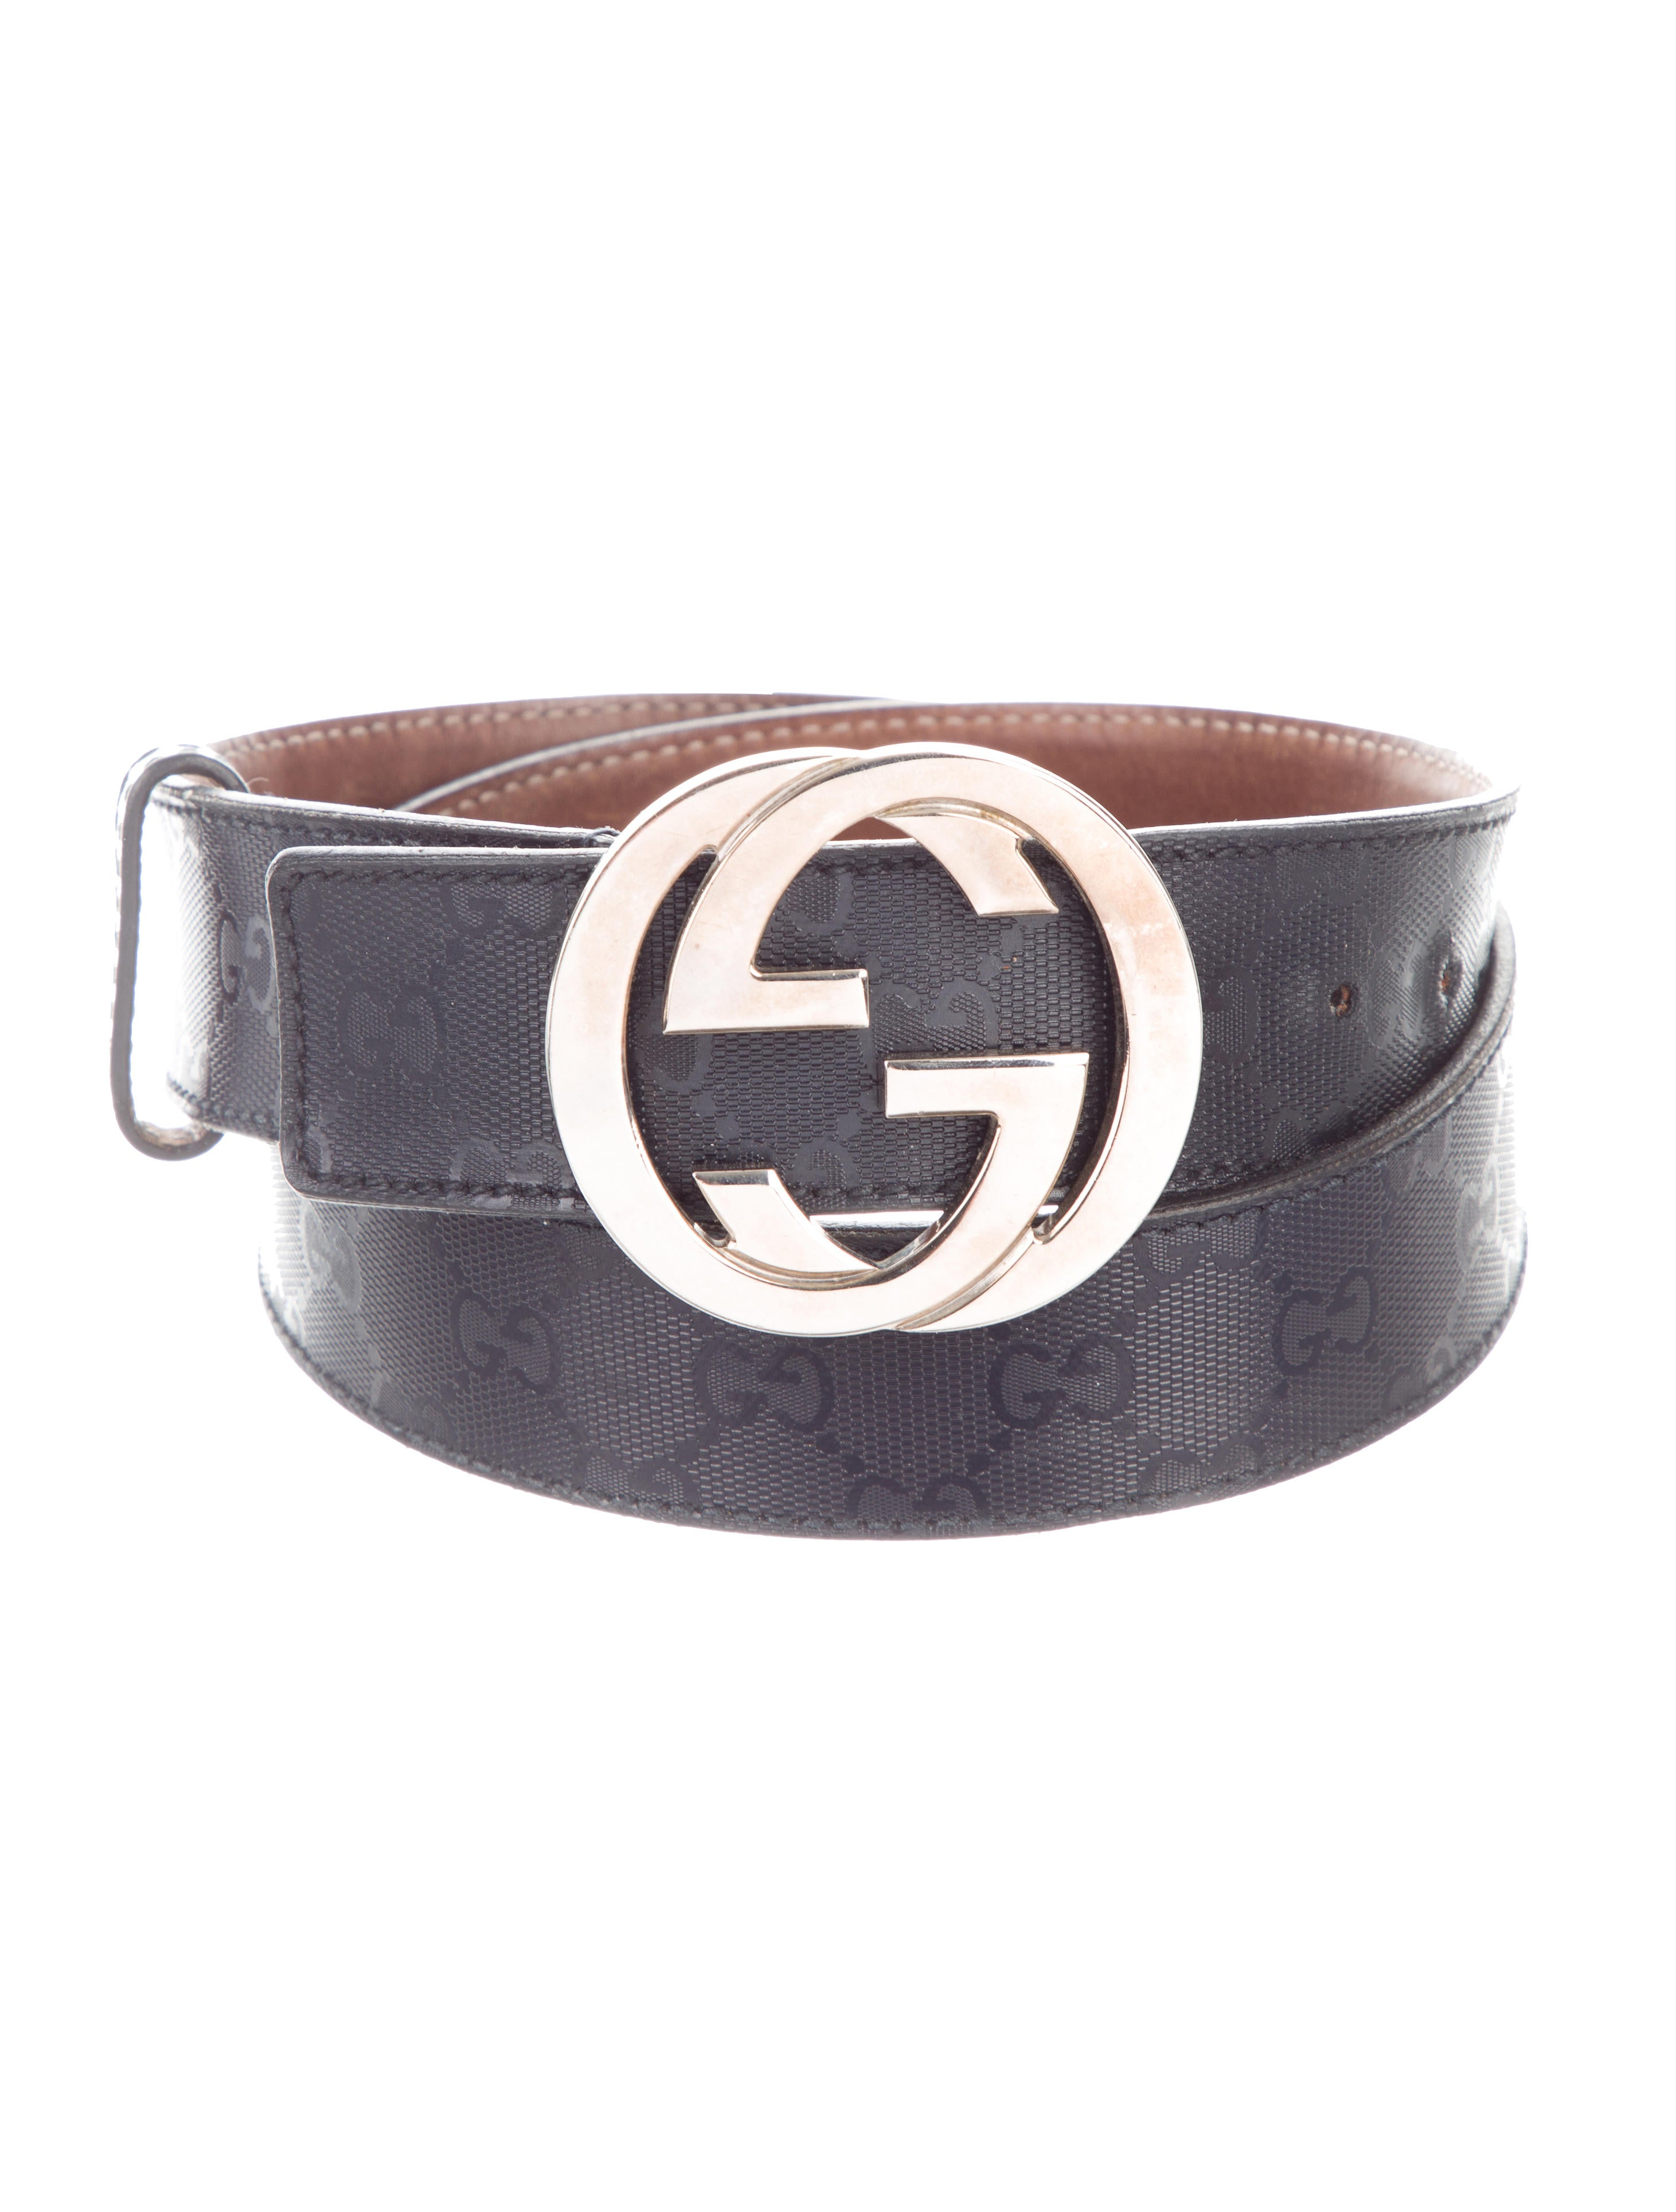 96e594dc08b Gucci GG Imprimé Interlocking GG Belt - Accessories - GUC302941 ...